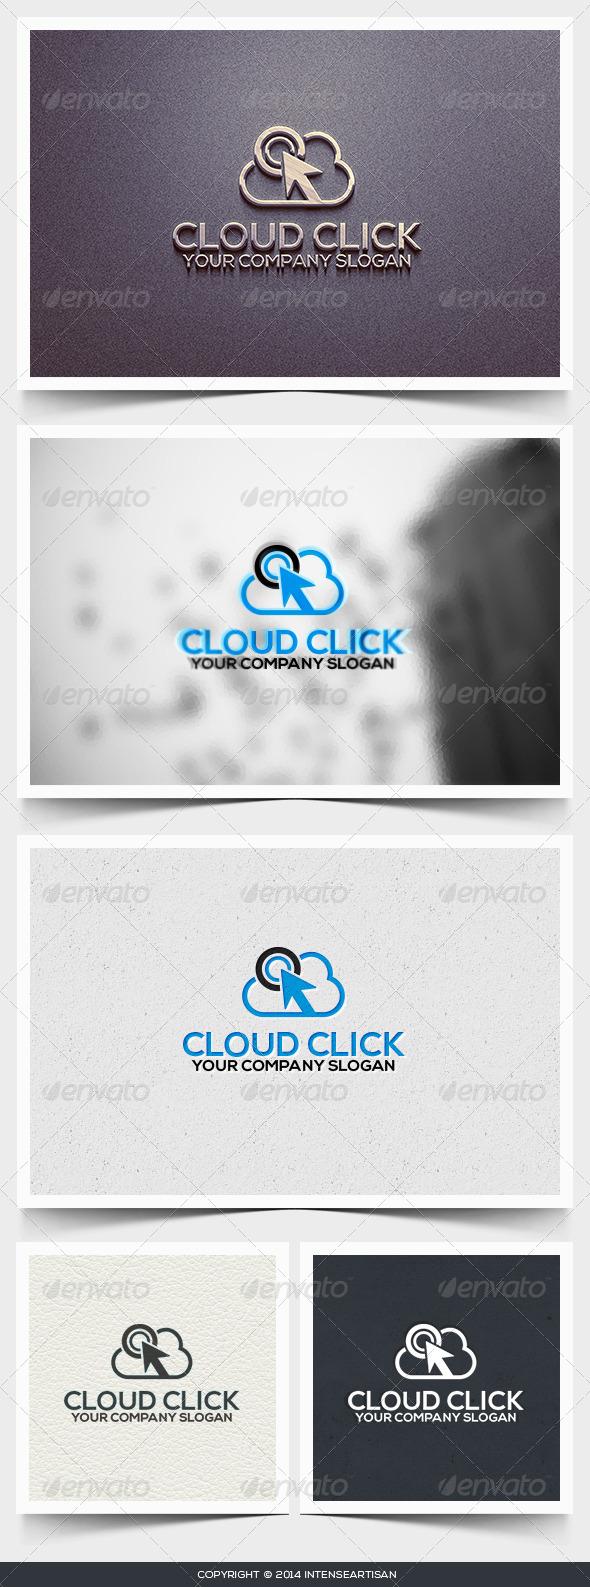 Cloud Click Logo Template